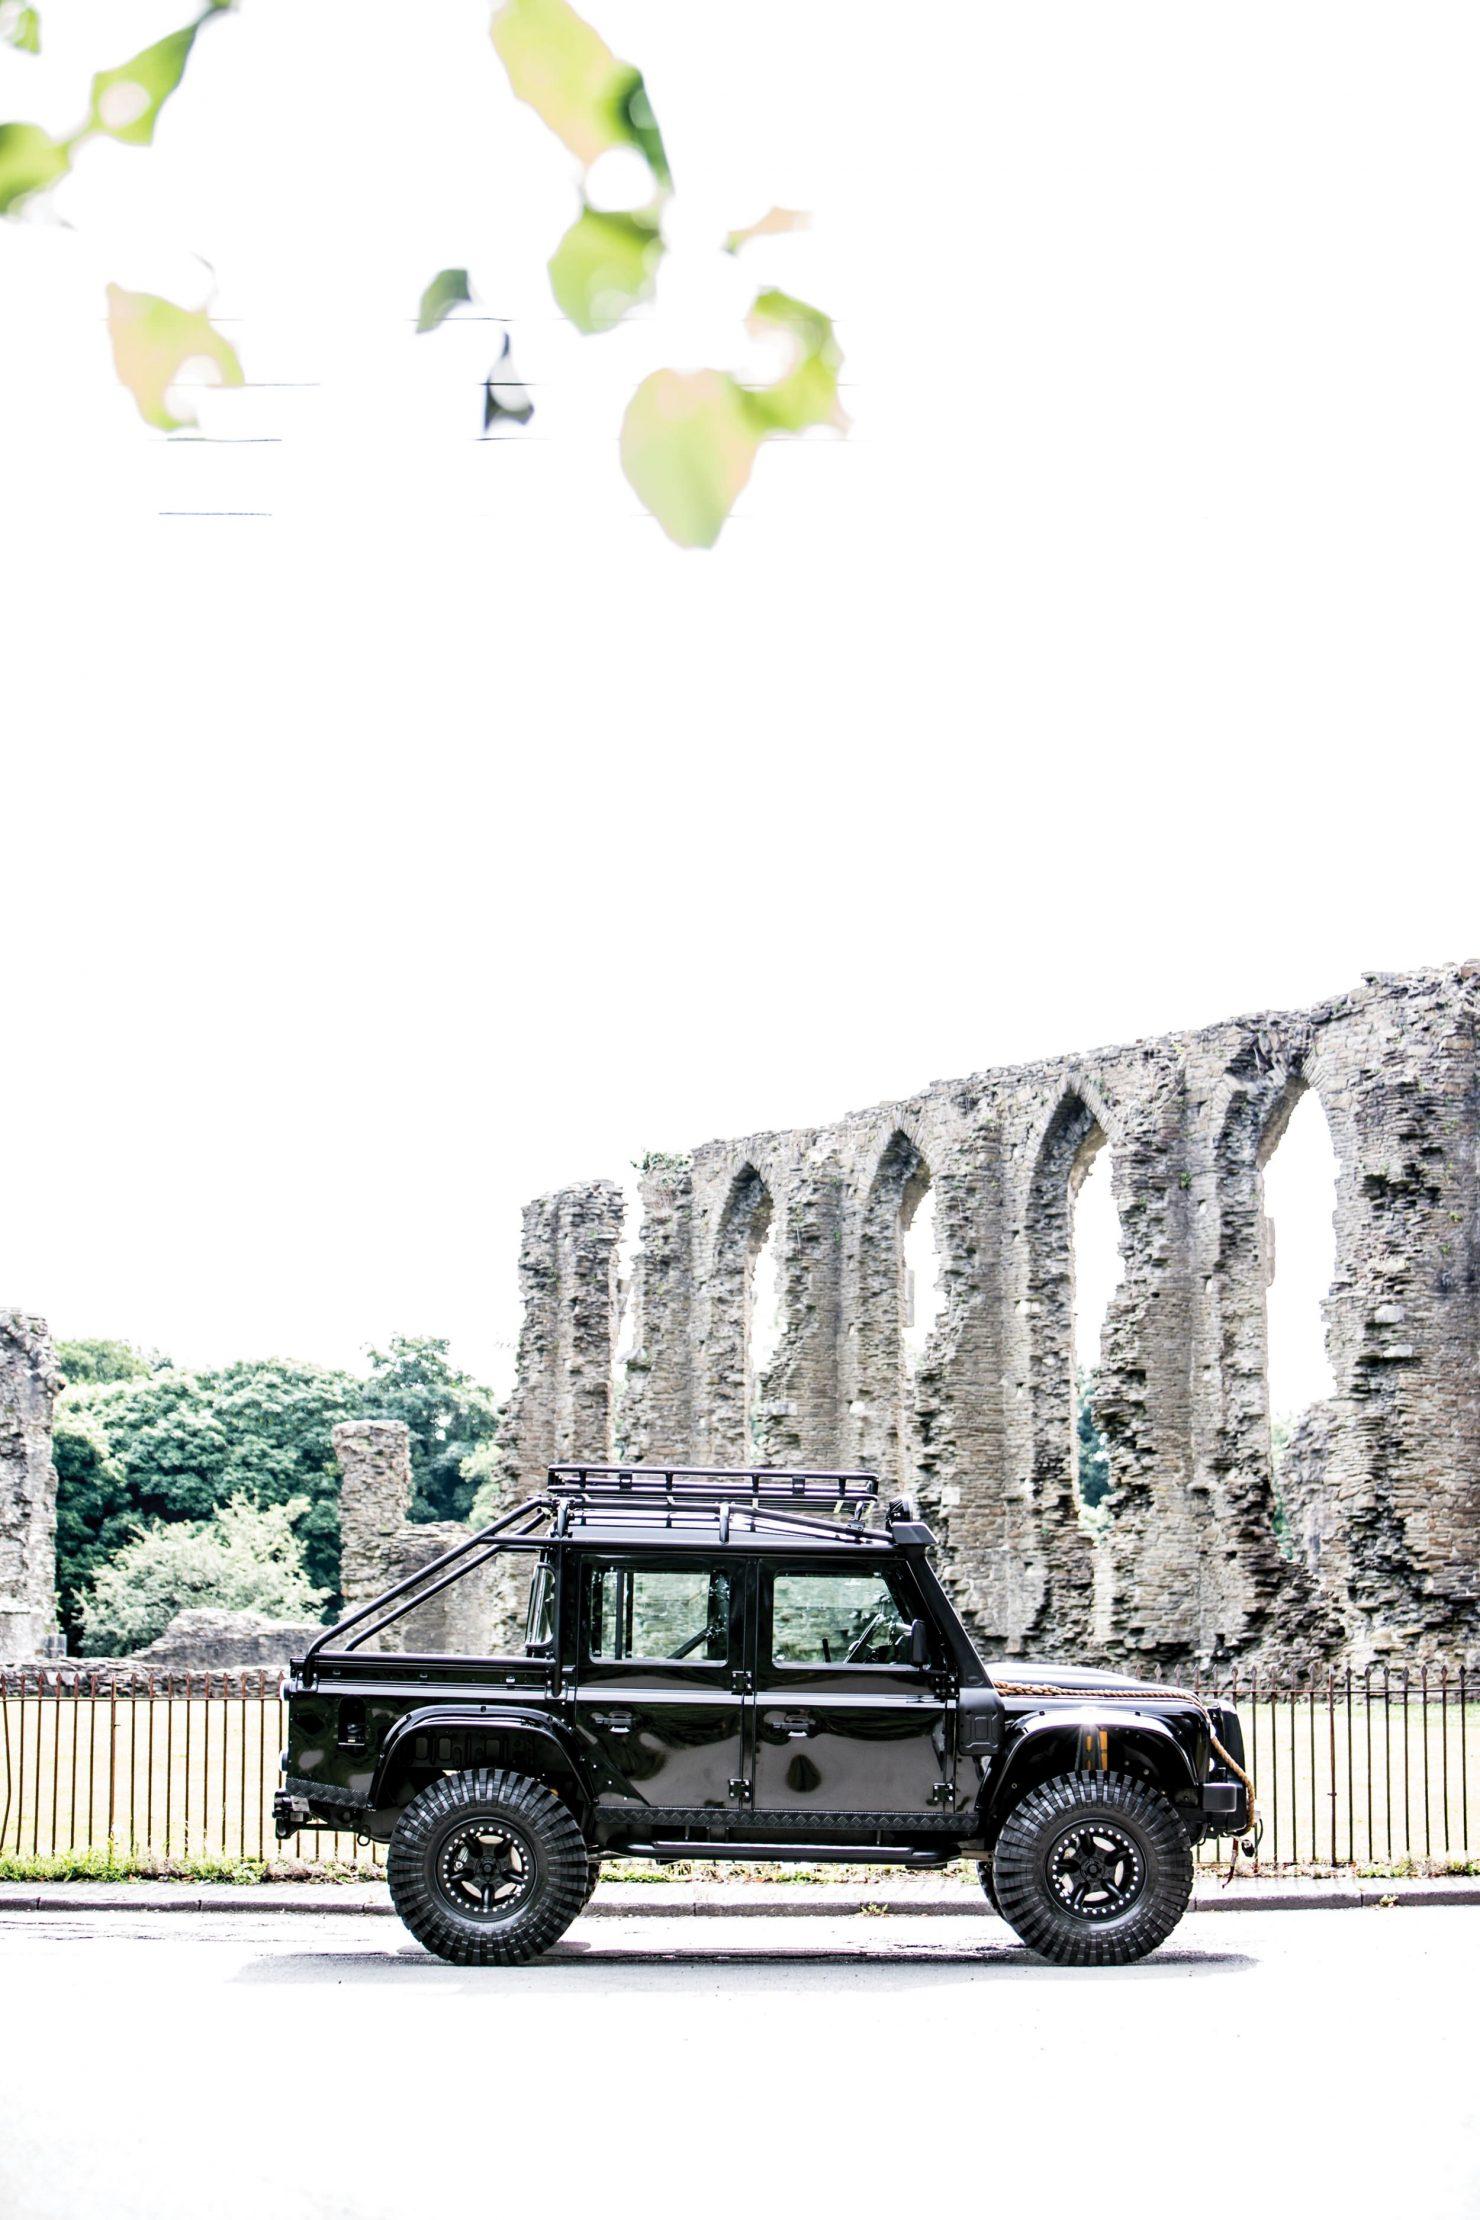 james bond spectre land rover defender svx 4 1480x2220 - Ex-James Bond Spectre - Land Rover Defender SVX